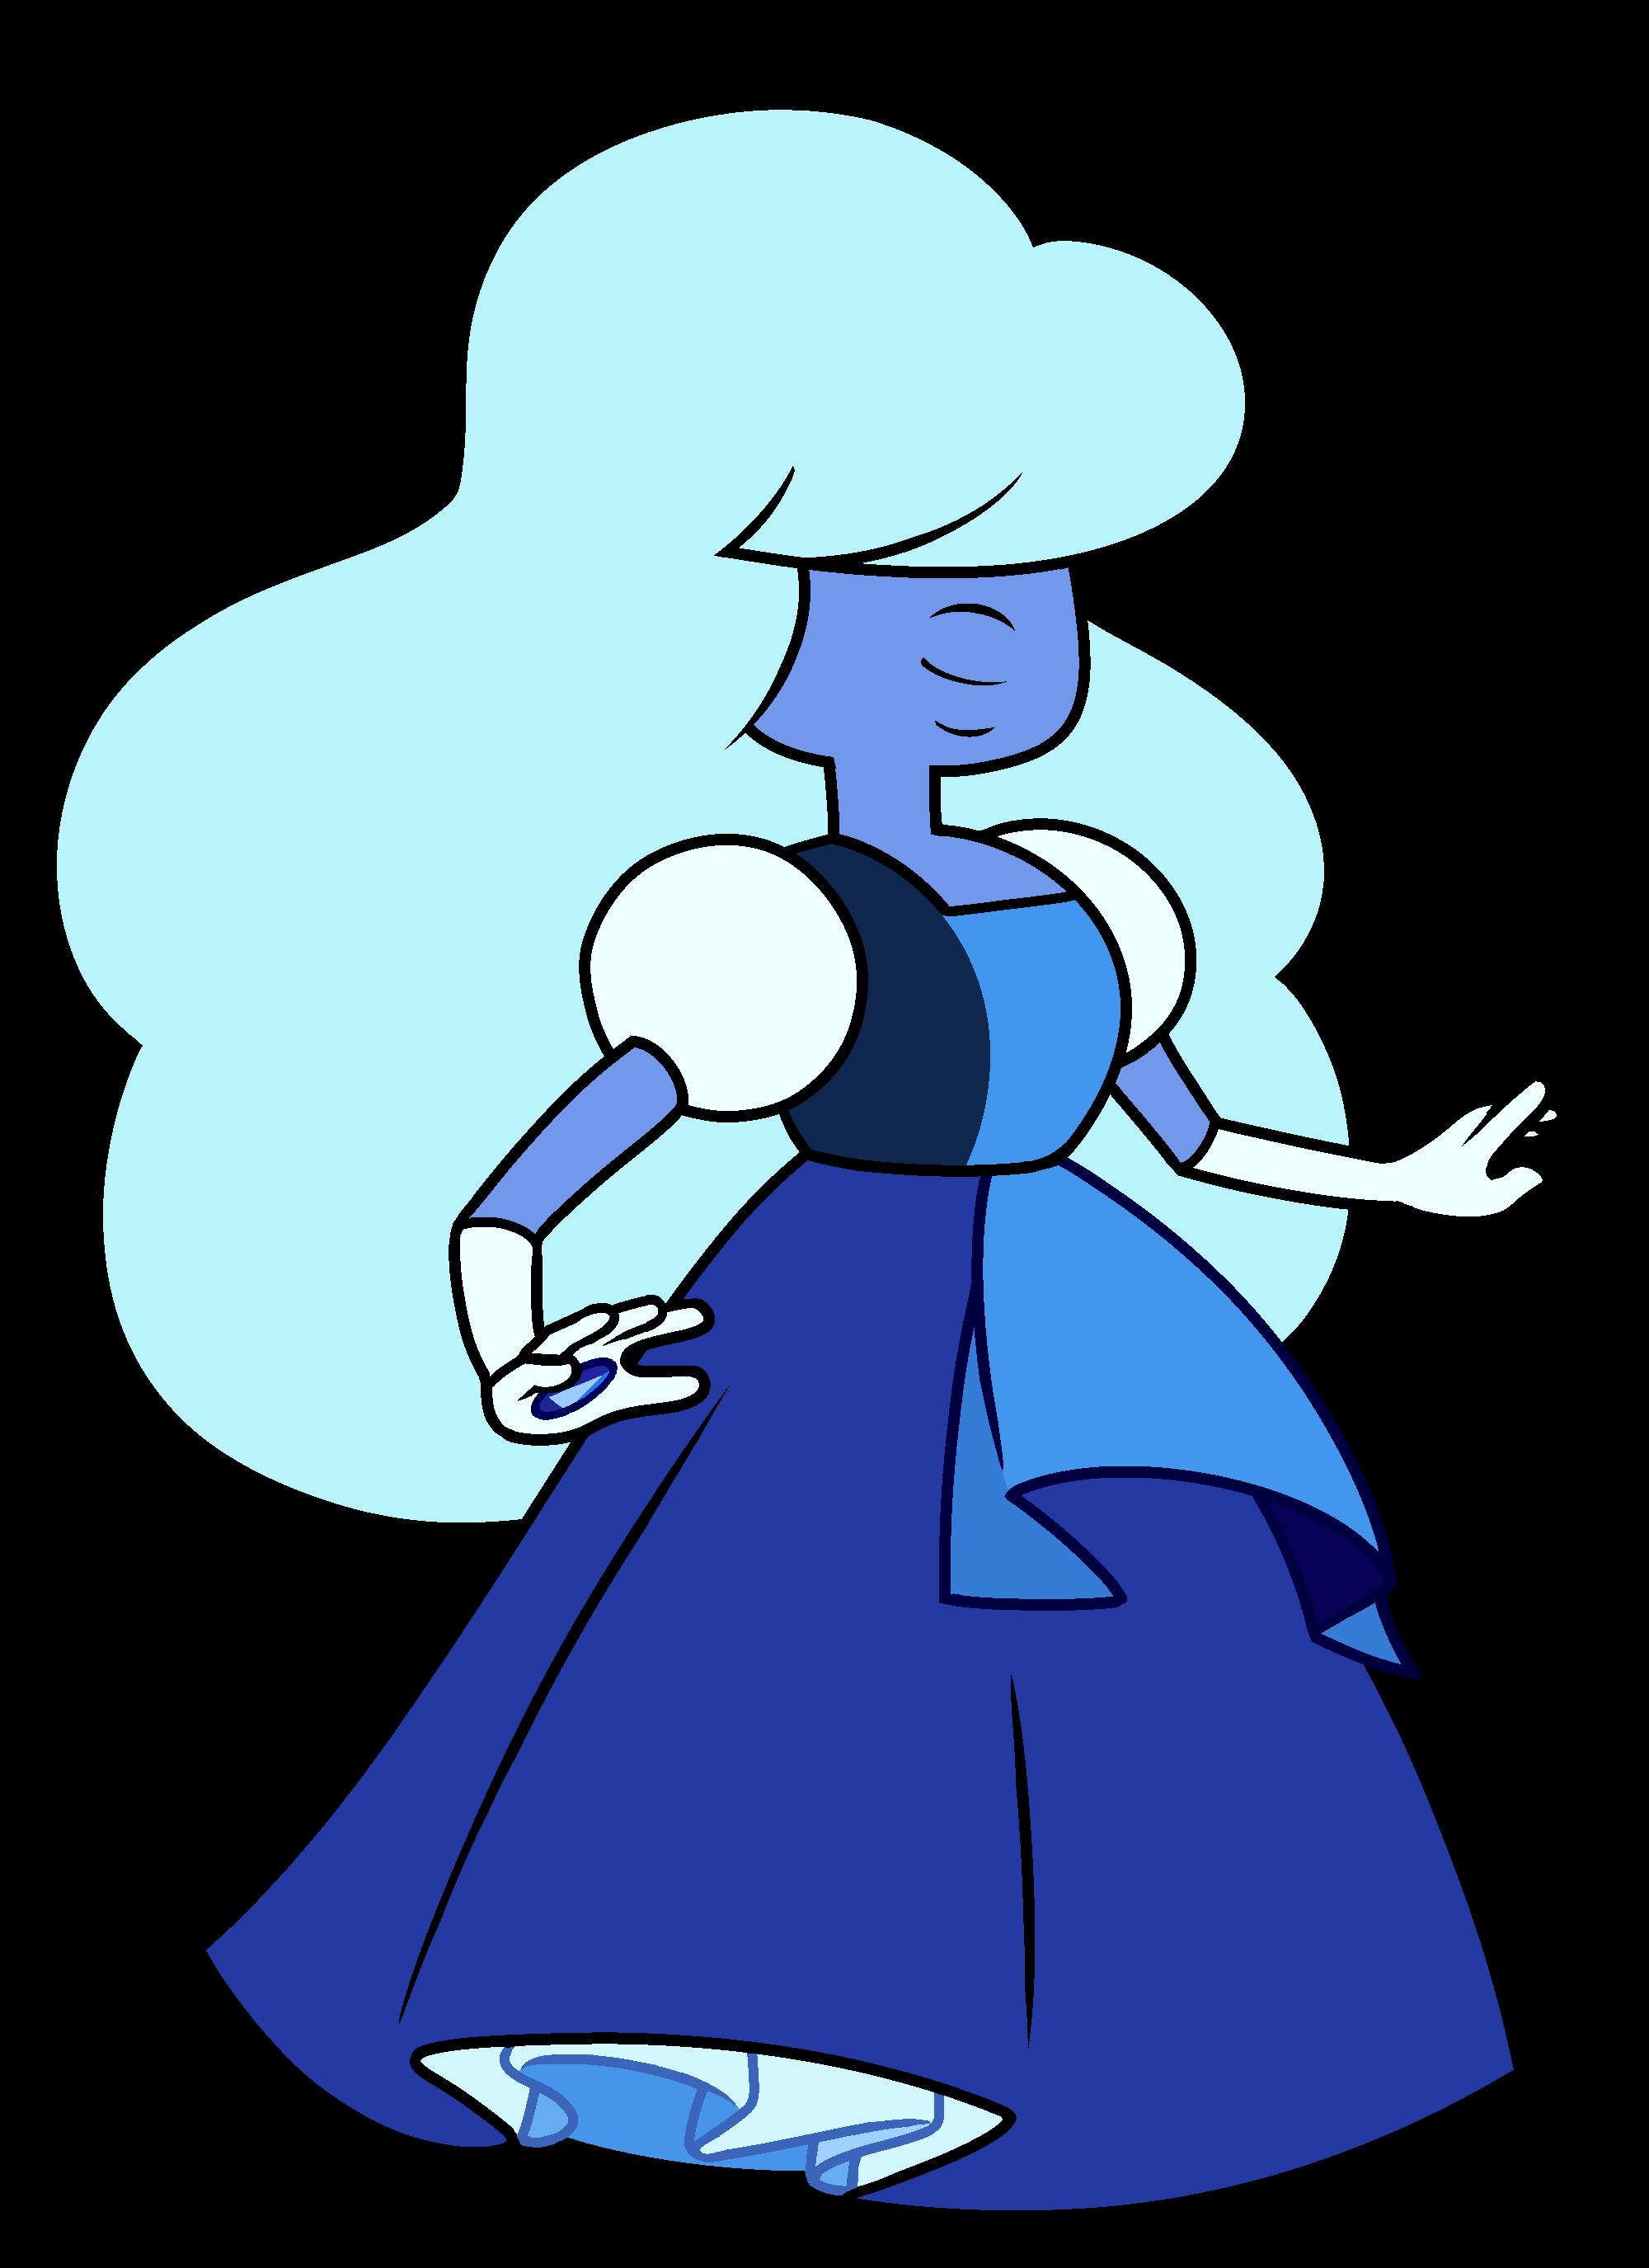 Steven Universe Lapis Lazuli Meme By Wcher999 On Deviantart